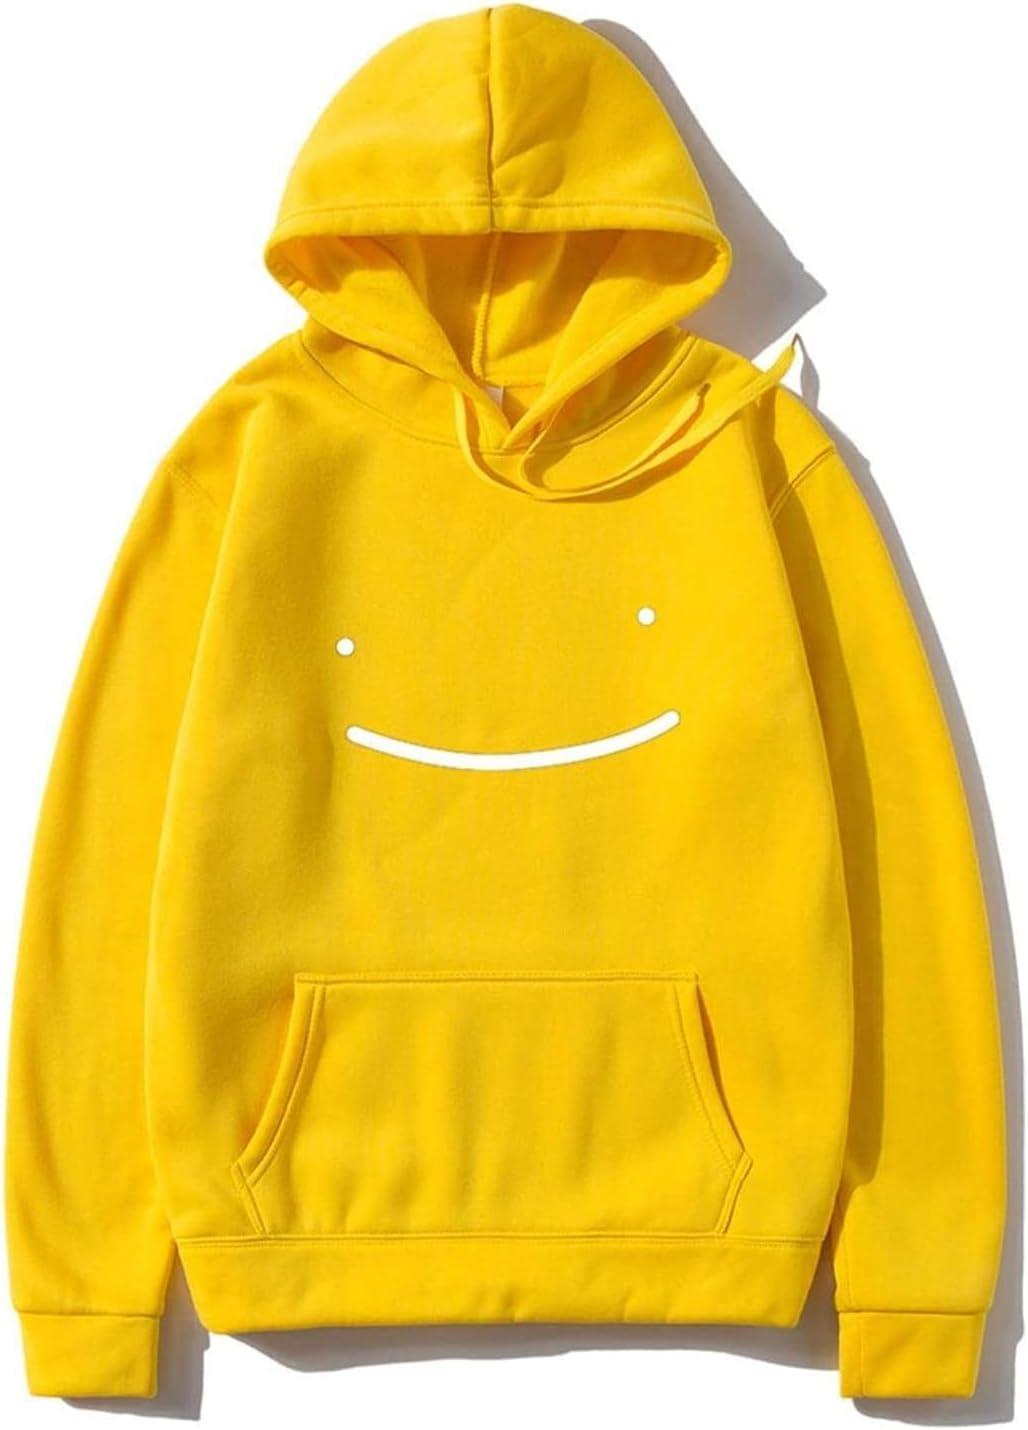 MAORR Cartoon Hooded Sweater, Moletom Com Capuz Moletom Masculino Feminino Harajuku Pullover Moletom Streetwear Moda Casual Roupas Grandes (Color : 13, Size : -M)